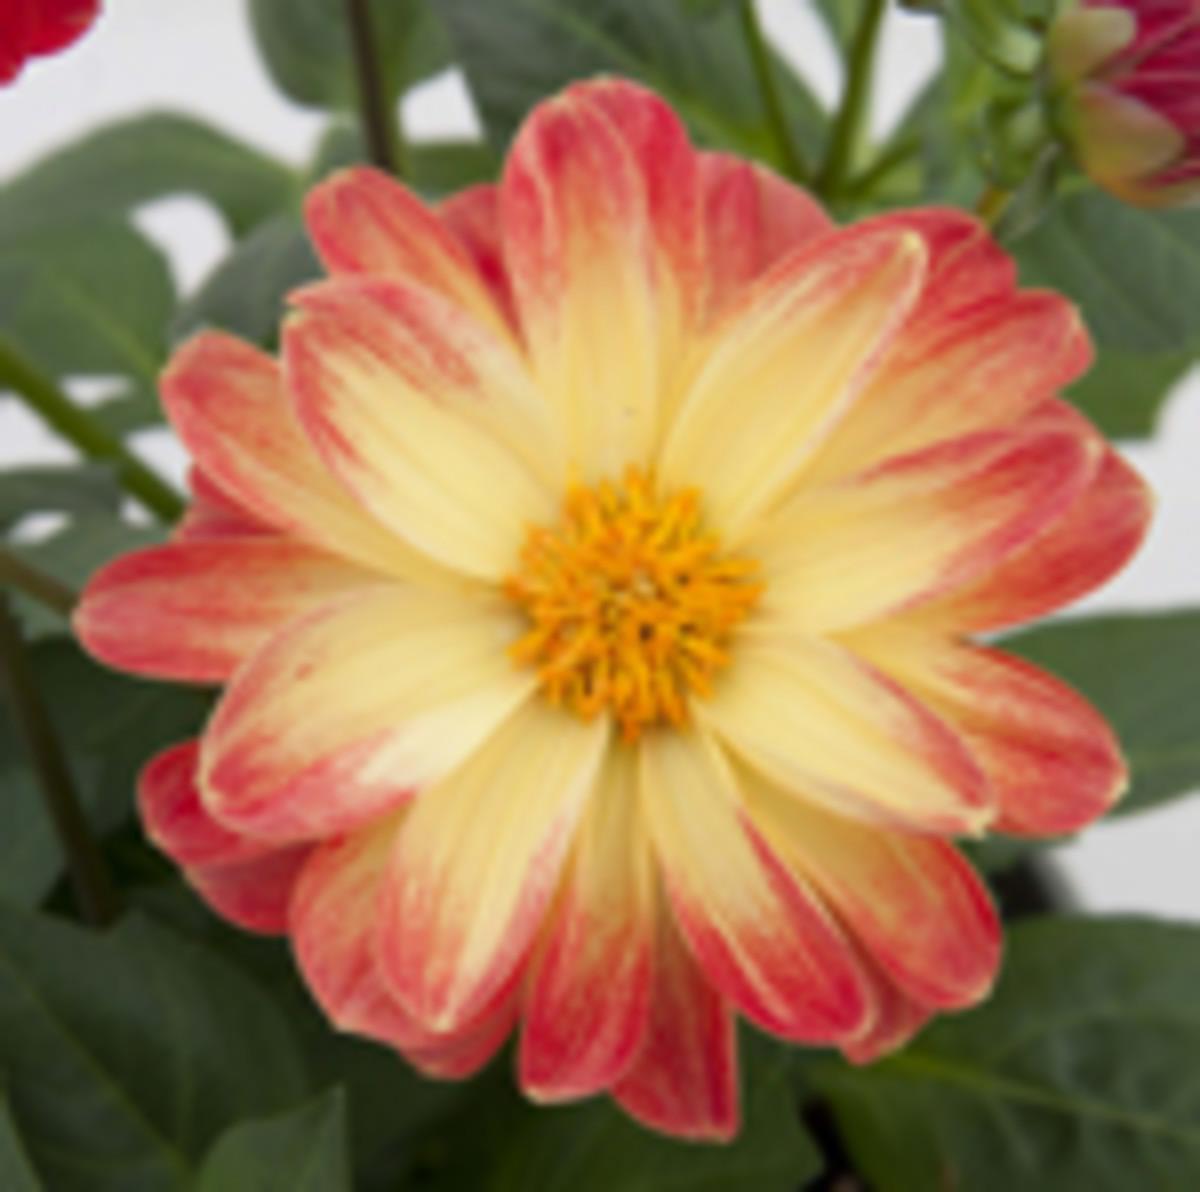 Dahlia_Dalaya_Red_Yellow_Eye_Bloom